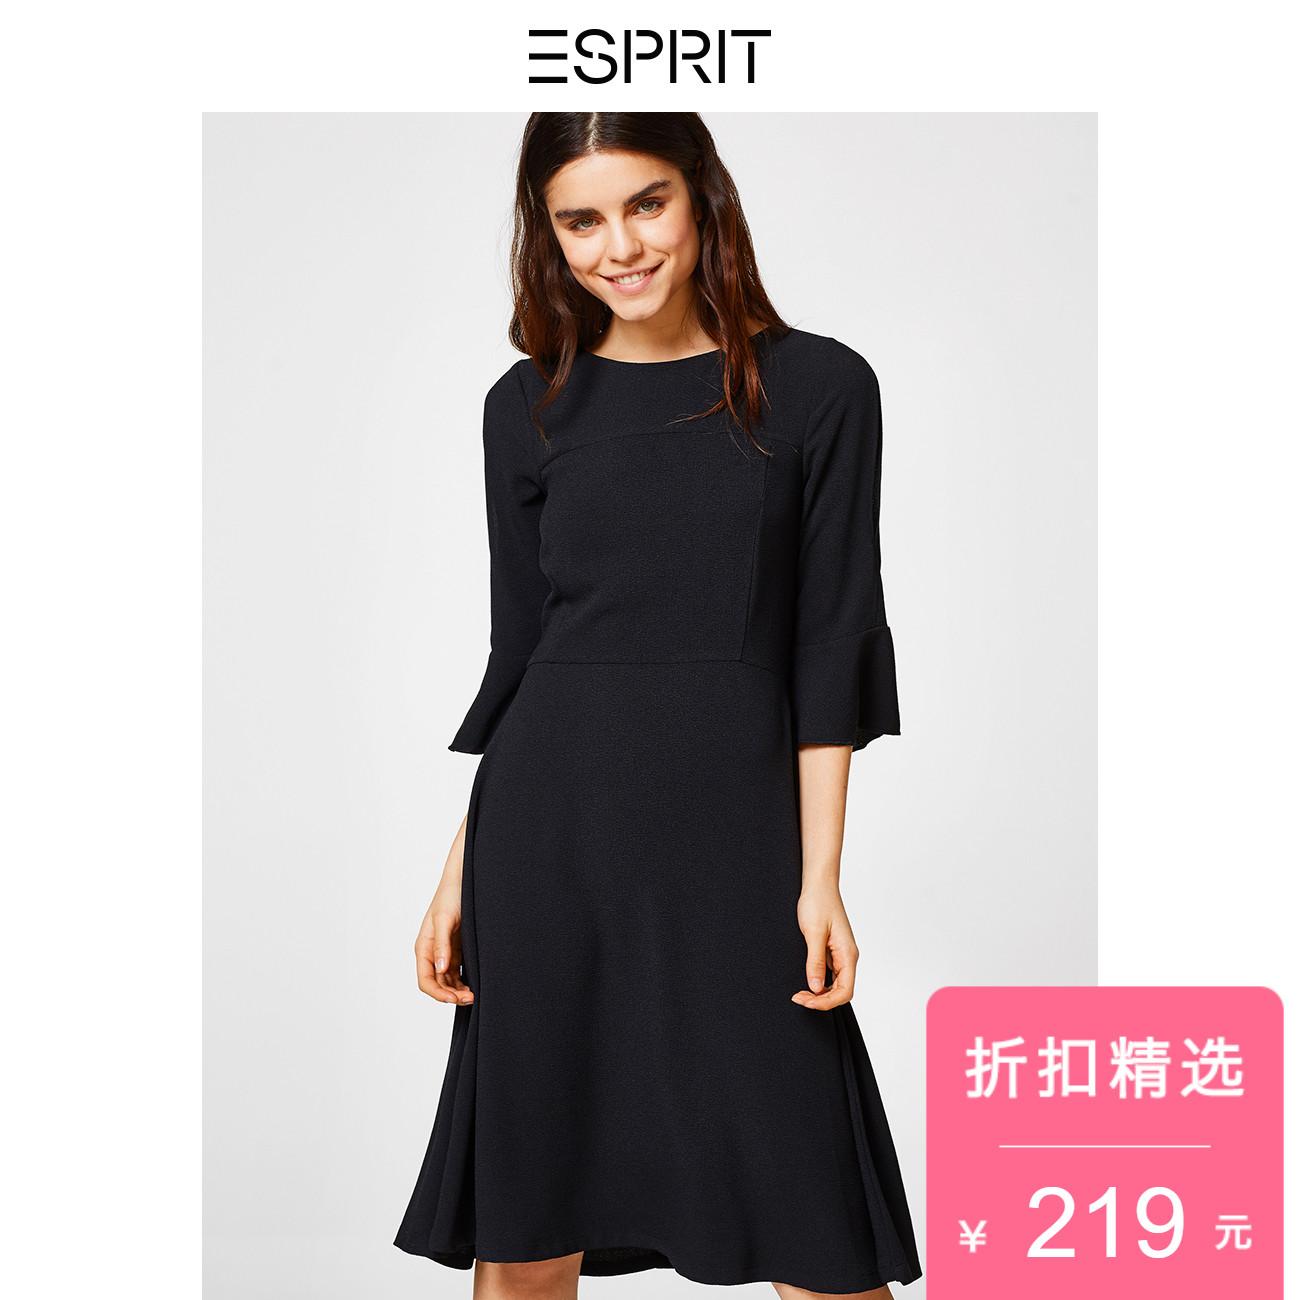 ESPRIT EDC女装夏基本款纯色圆领喇叭袖大摆连衣裙-028CC1E009